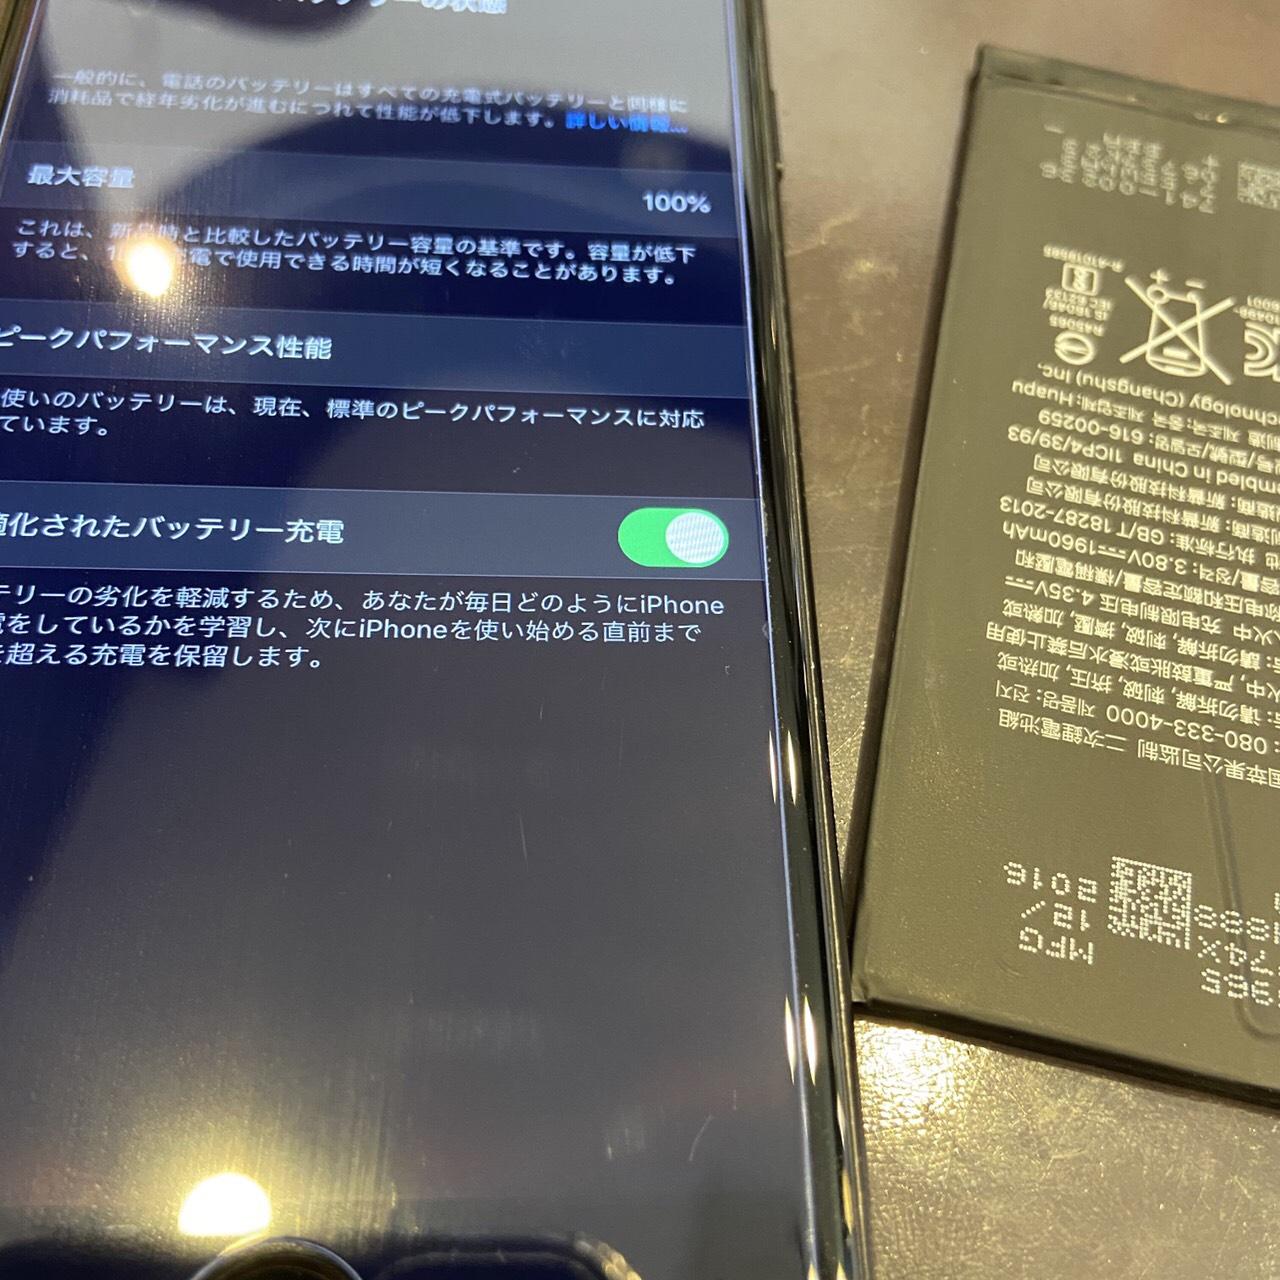 iPhone8のバッテリー交換/糟屋郡よりお越しのお客様!